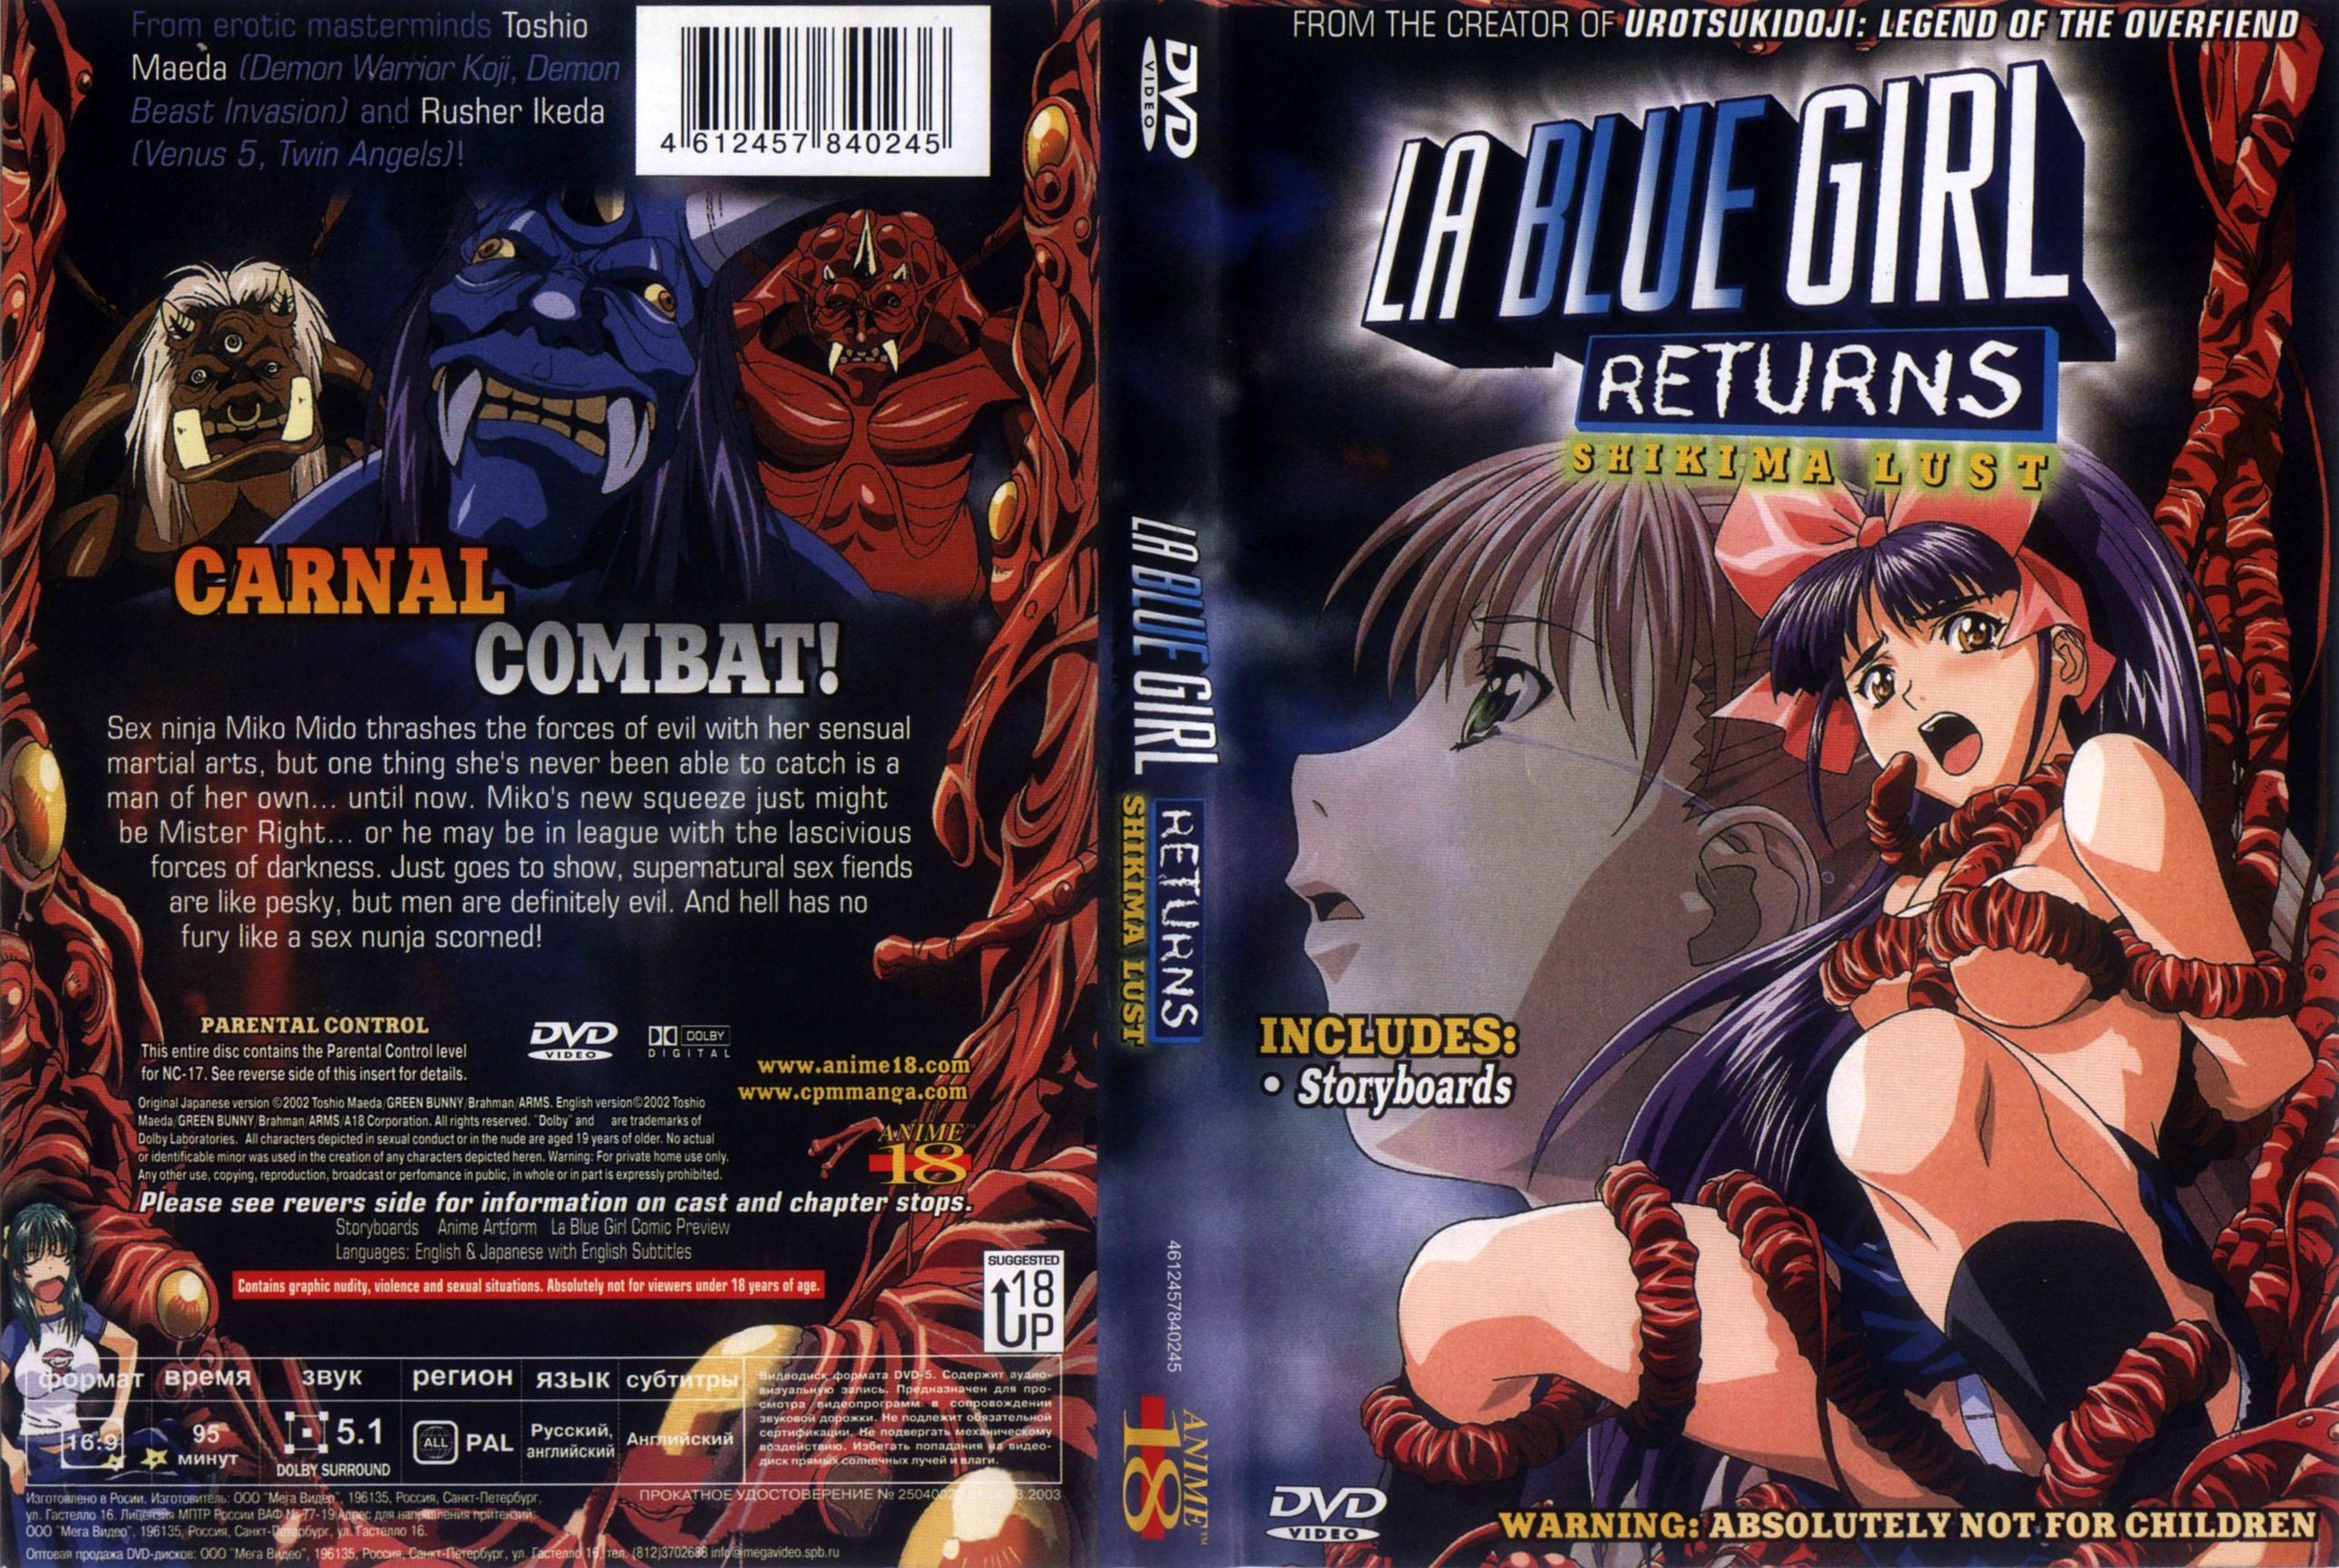 La blue girl hentai movie